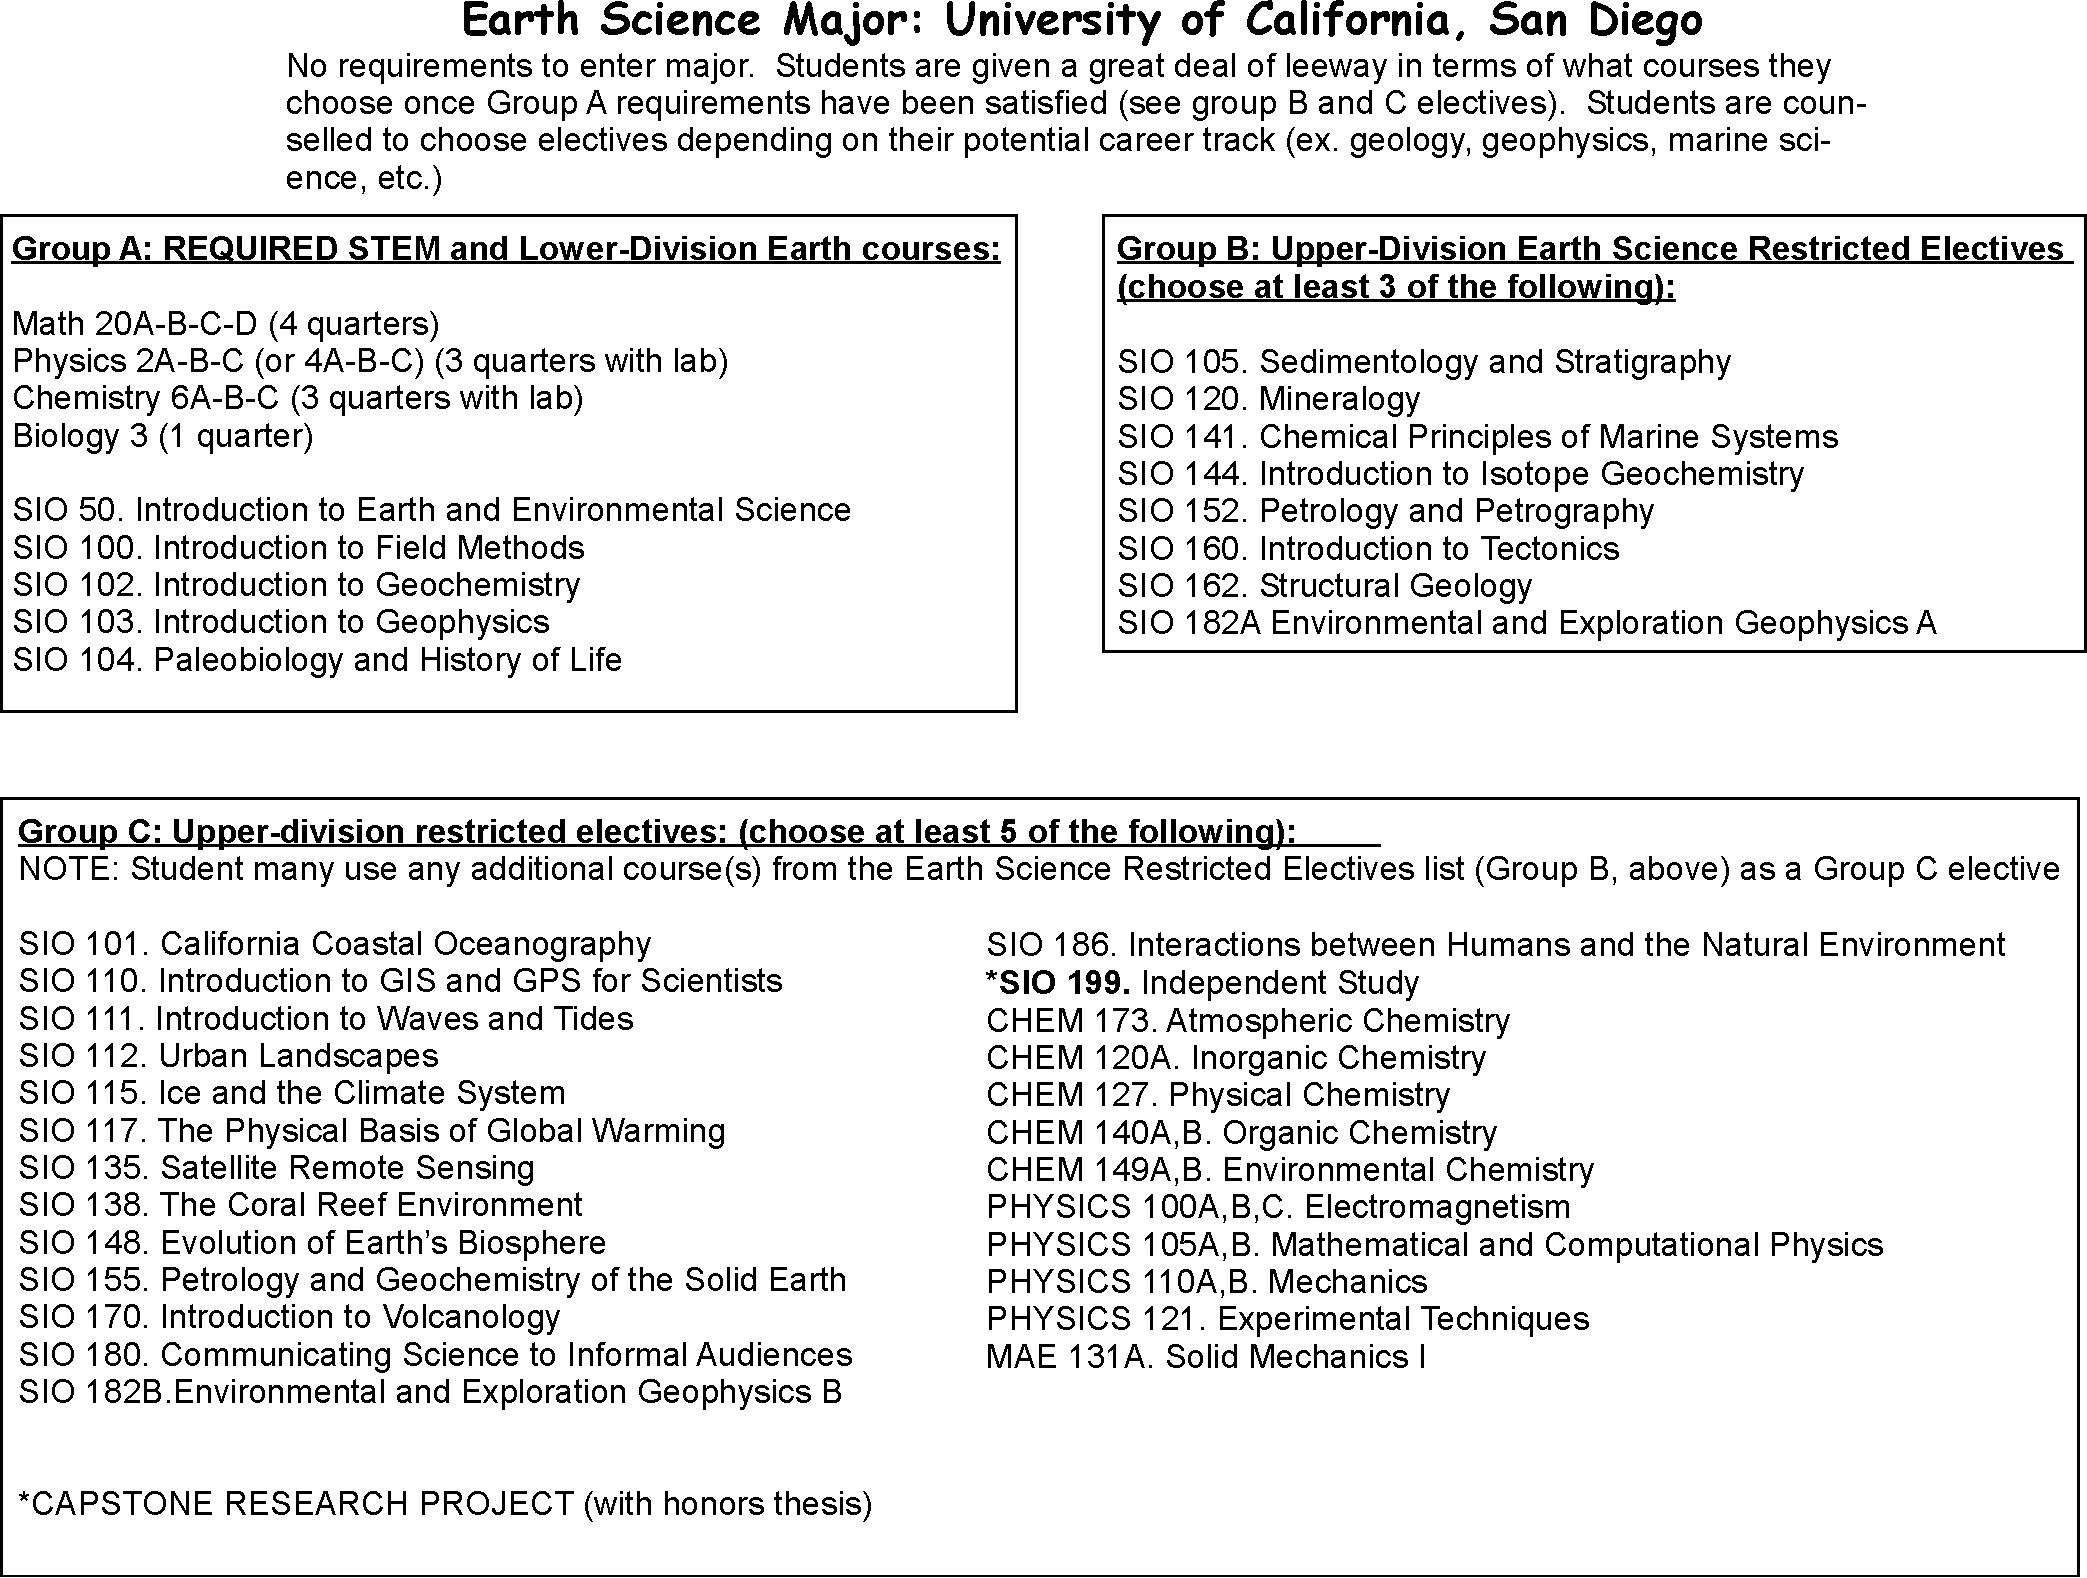 Uc San Diego Majors >> Earth Sciences At Uc San Diego